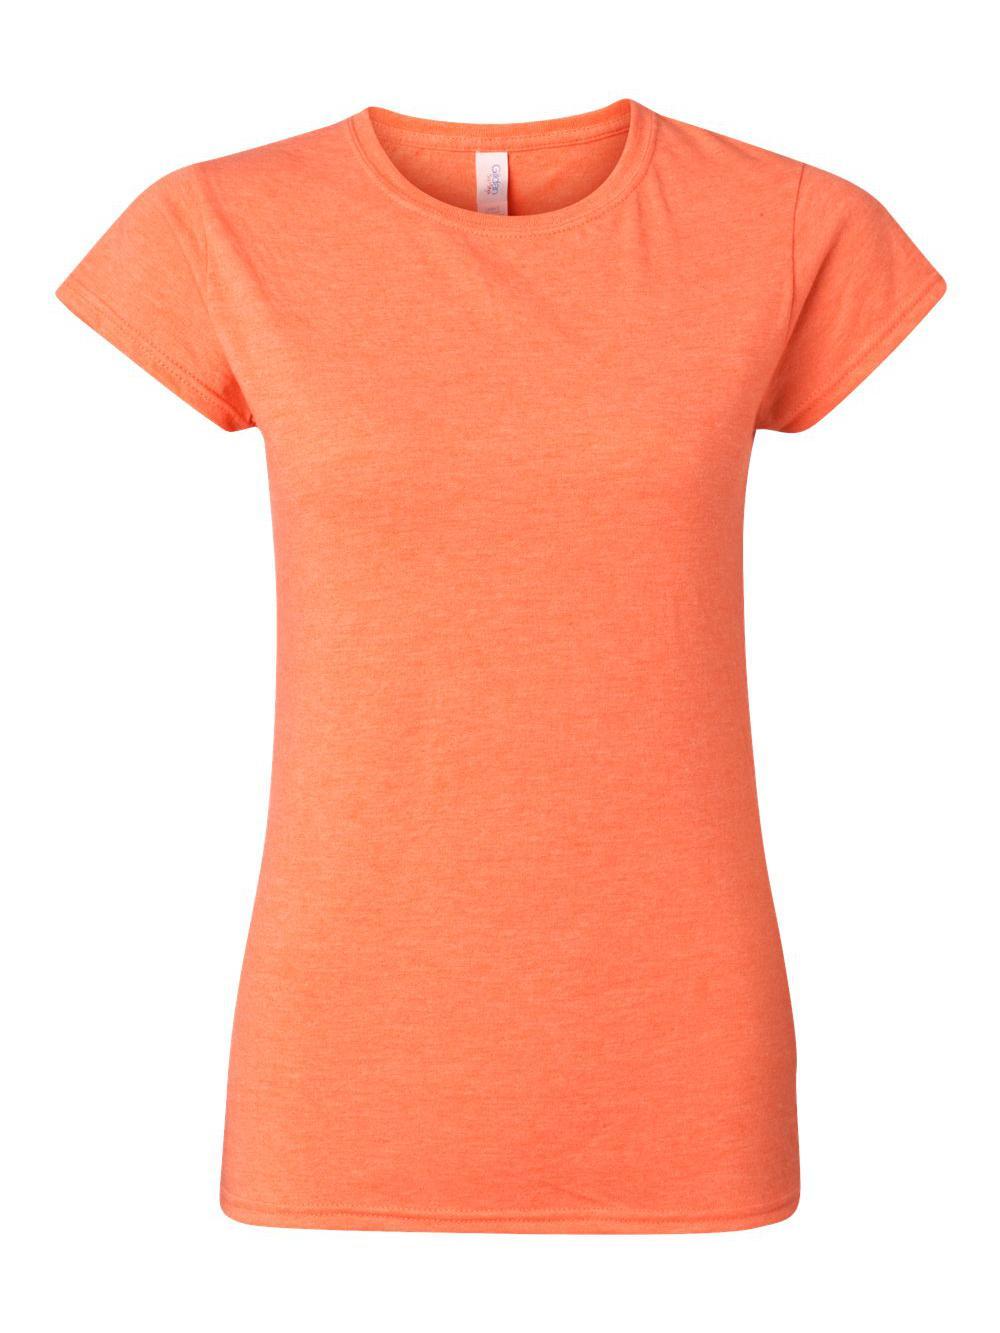 Gildan-Softstyle-Women-039-s-T-Shirt-64000L thumbnail 21